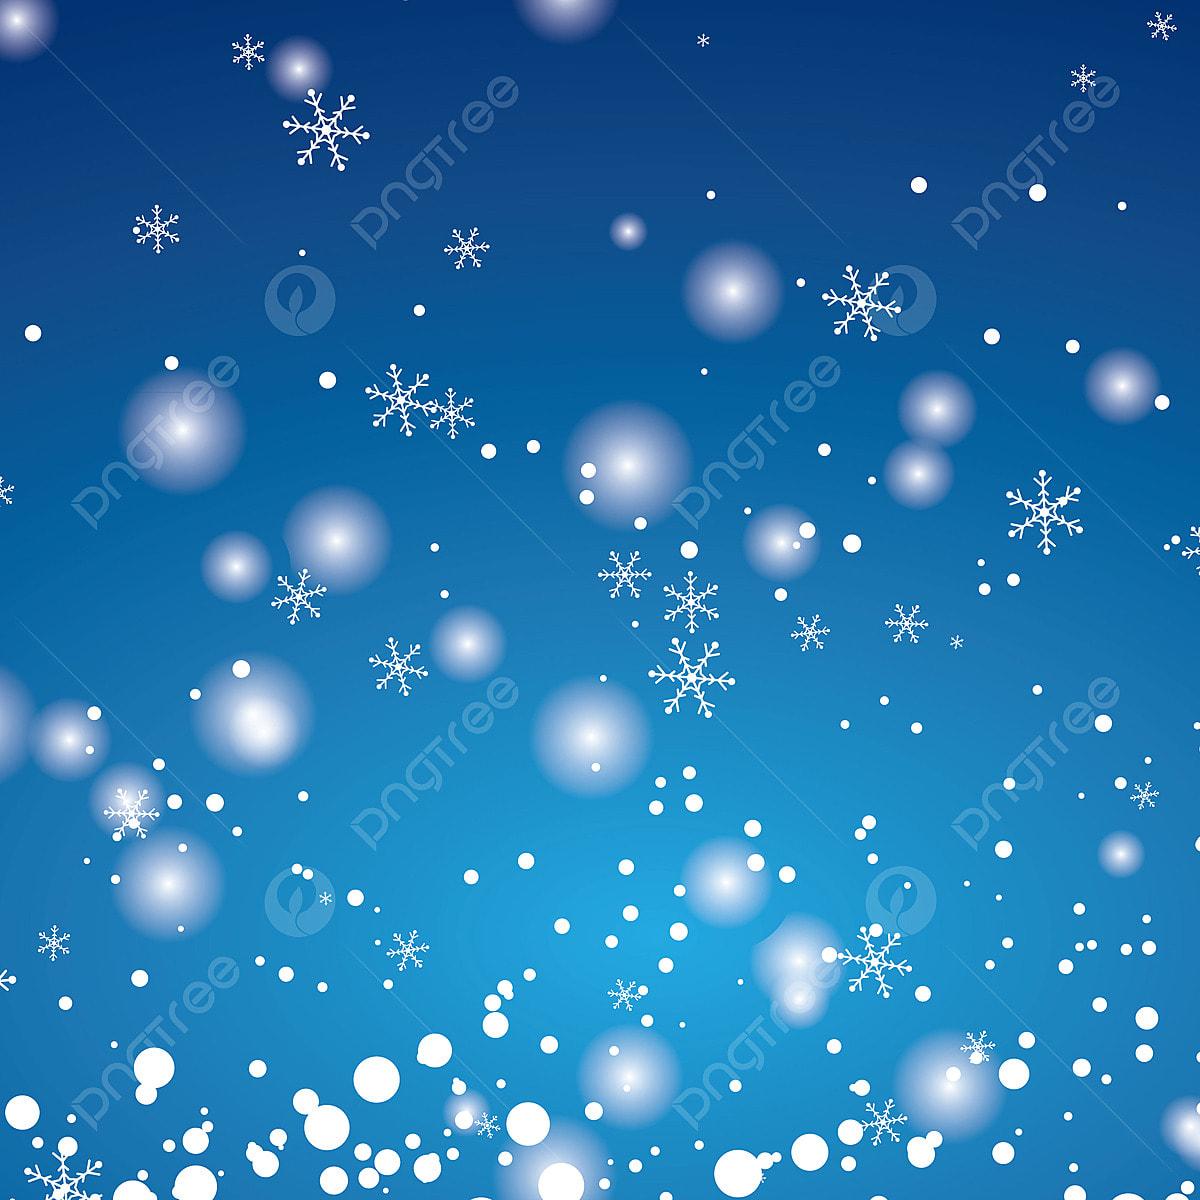 Elegant Christmas Background Hd.Elegant Christmas Background Vector Illustration Snow